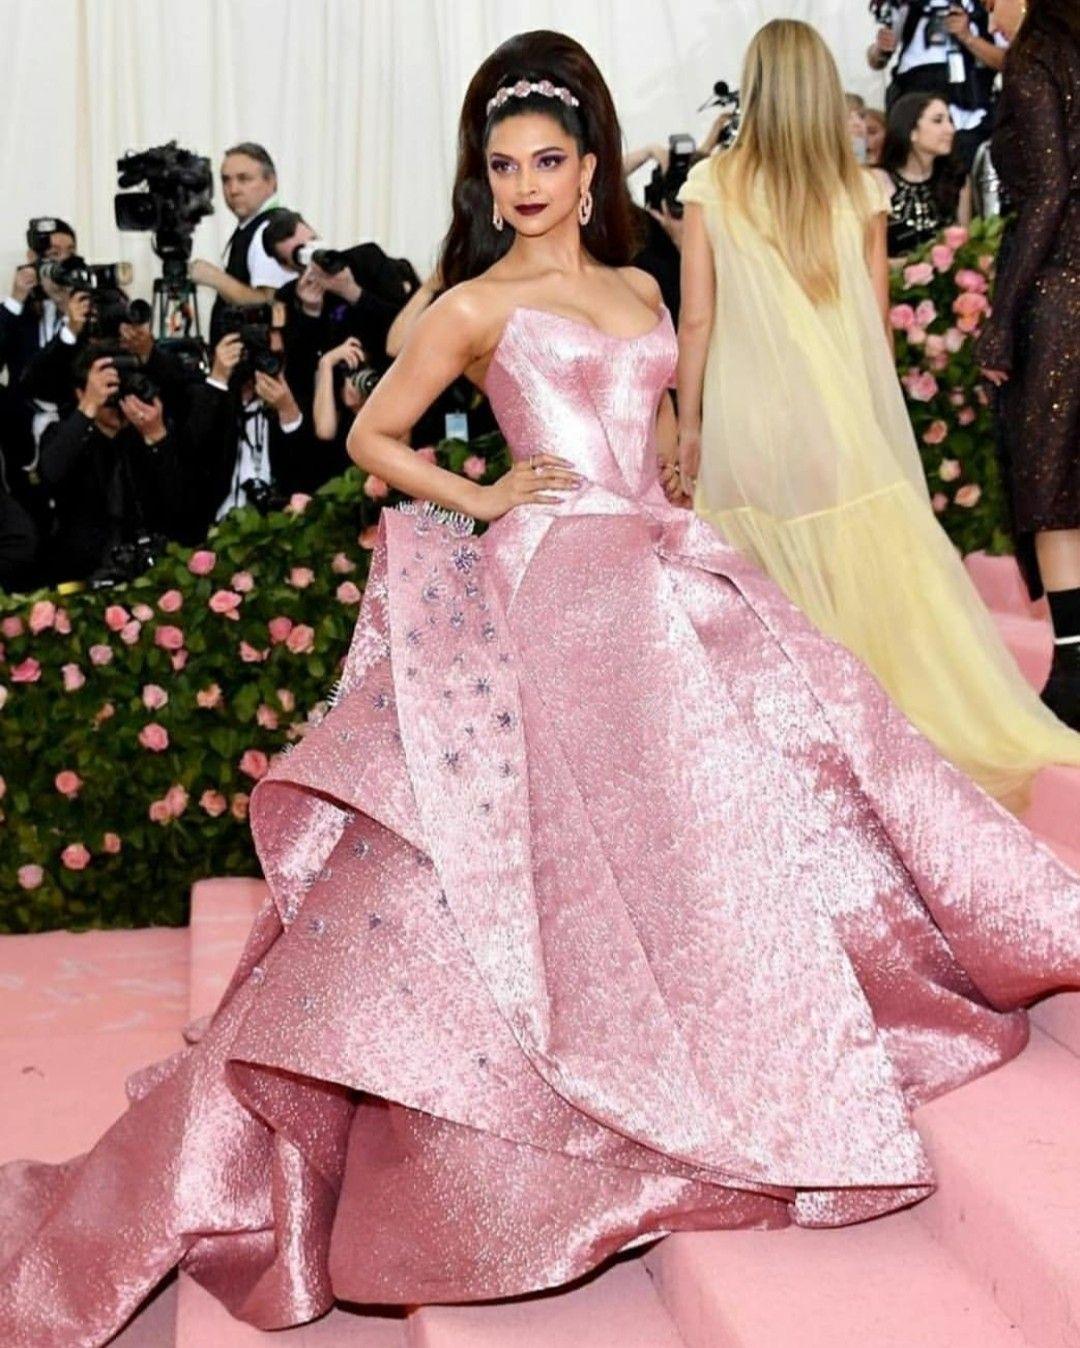 Deepika Padukone In Zac Posen For Met Gala 2019 Newyork Celebrity Wedding Dresses Gala Dresses Met Gala